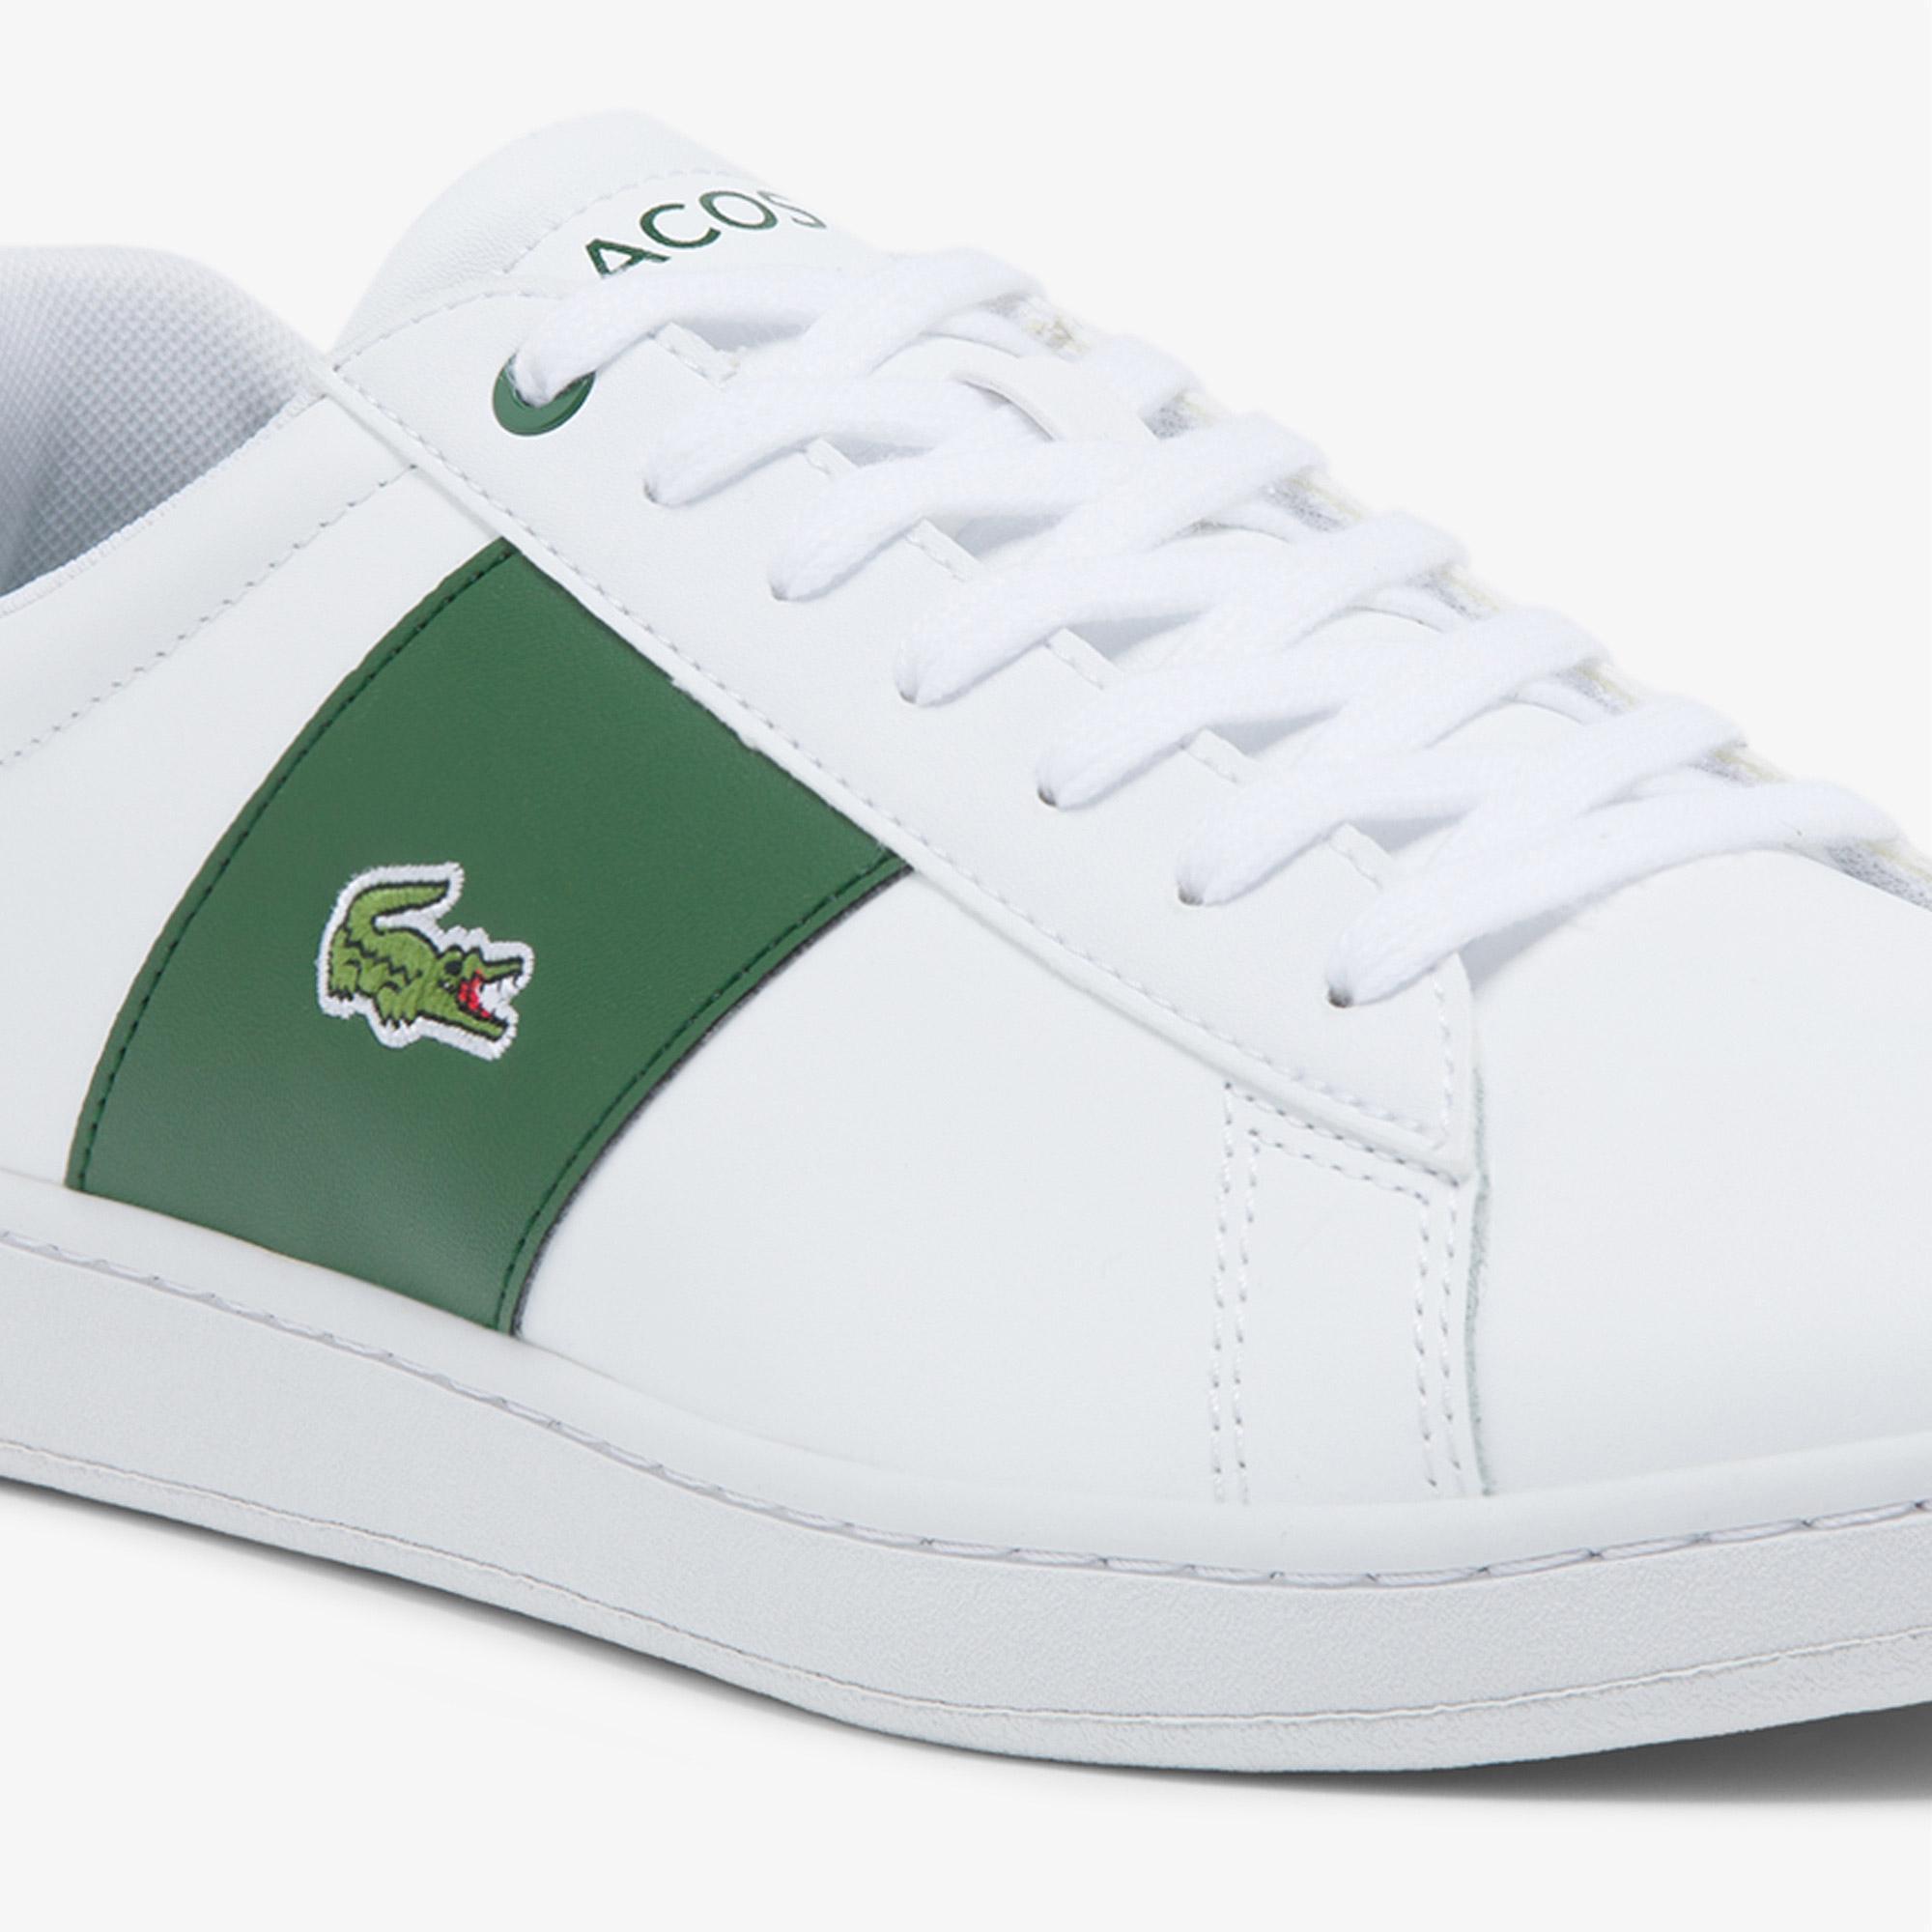 Lacoste Men's CARNABY Sneakers